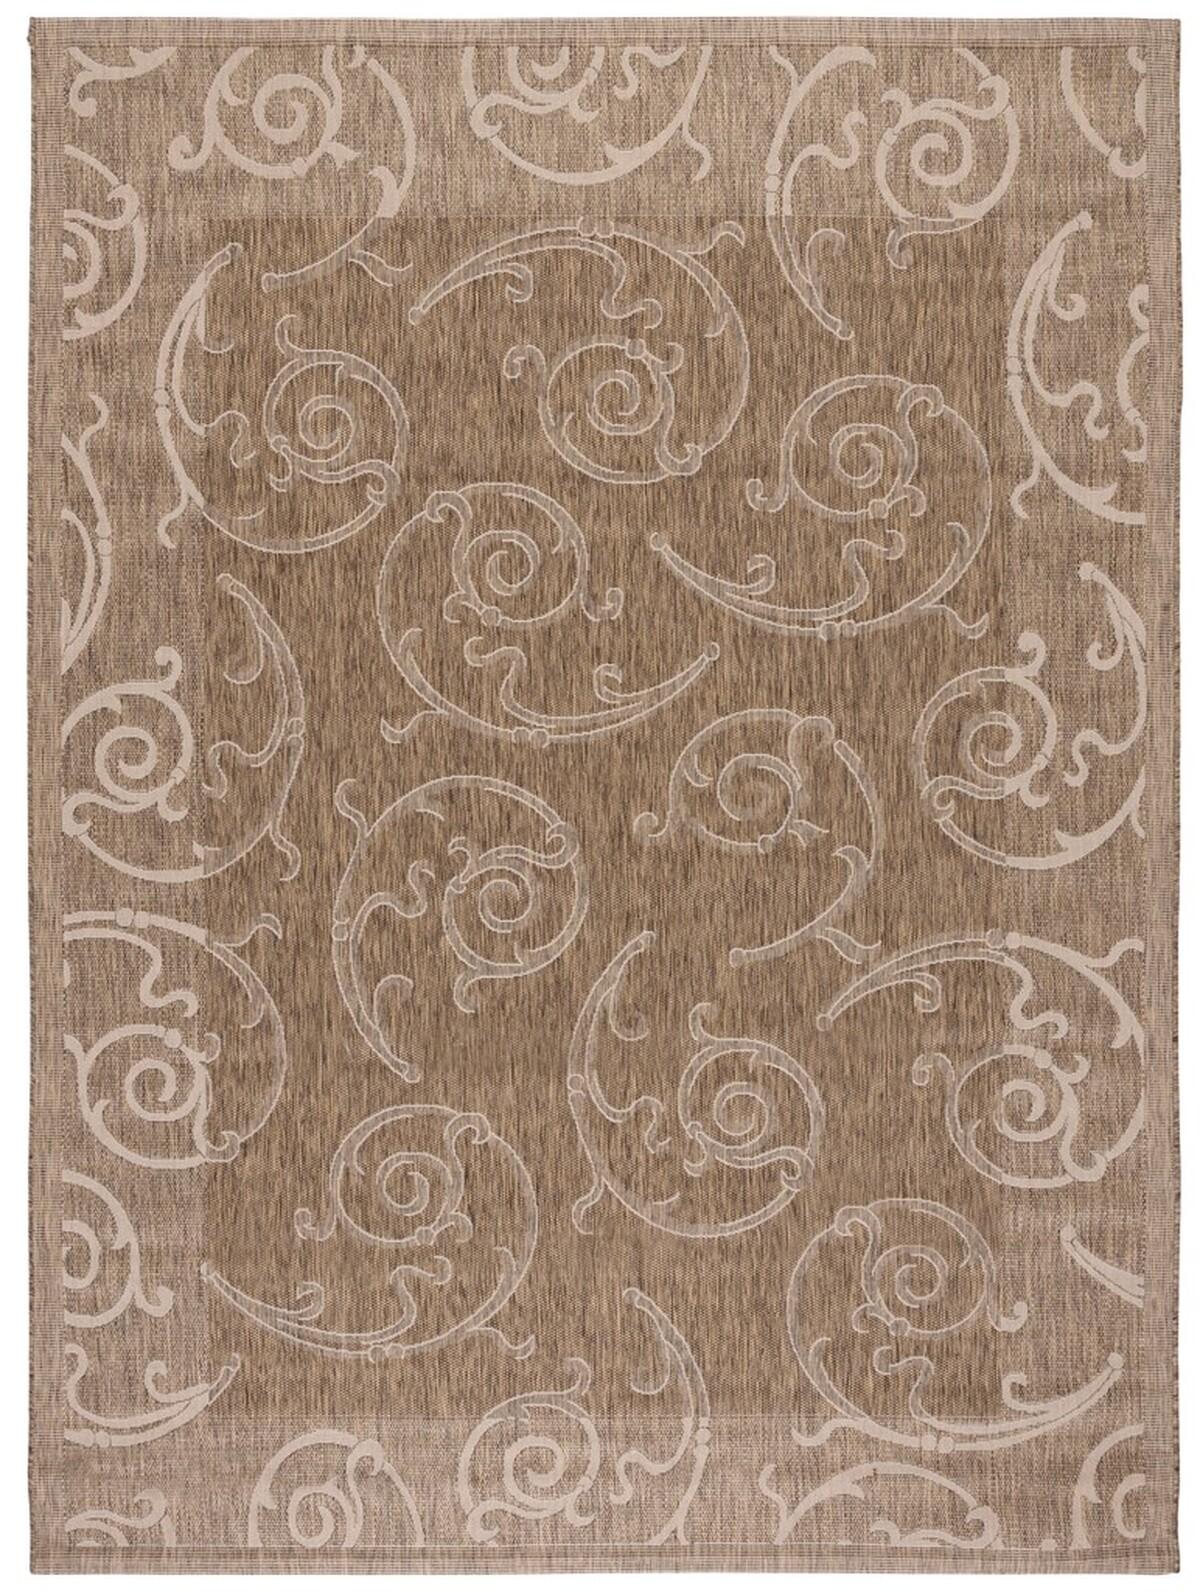 Scrolling Vine Outdoor Carpet Safavieh Com